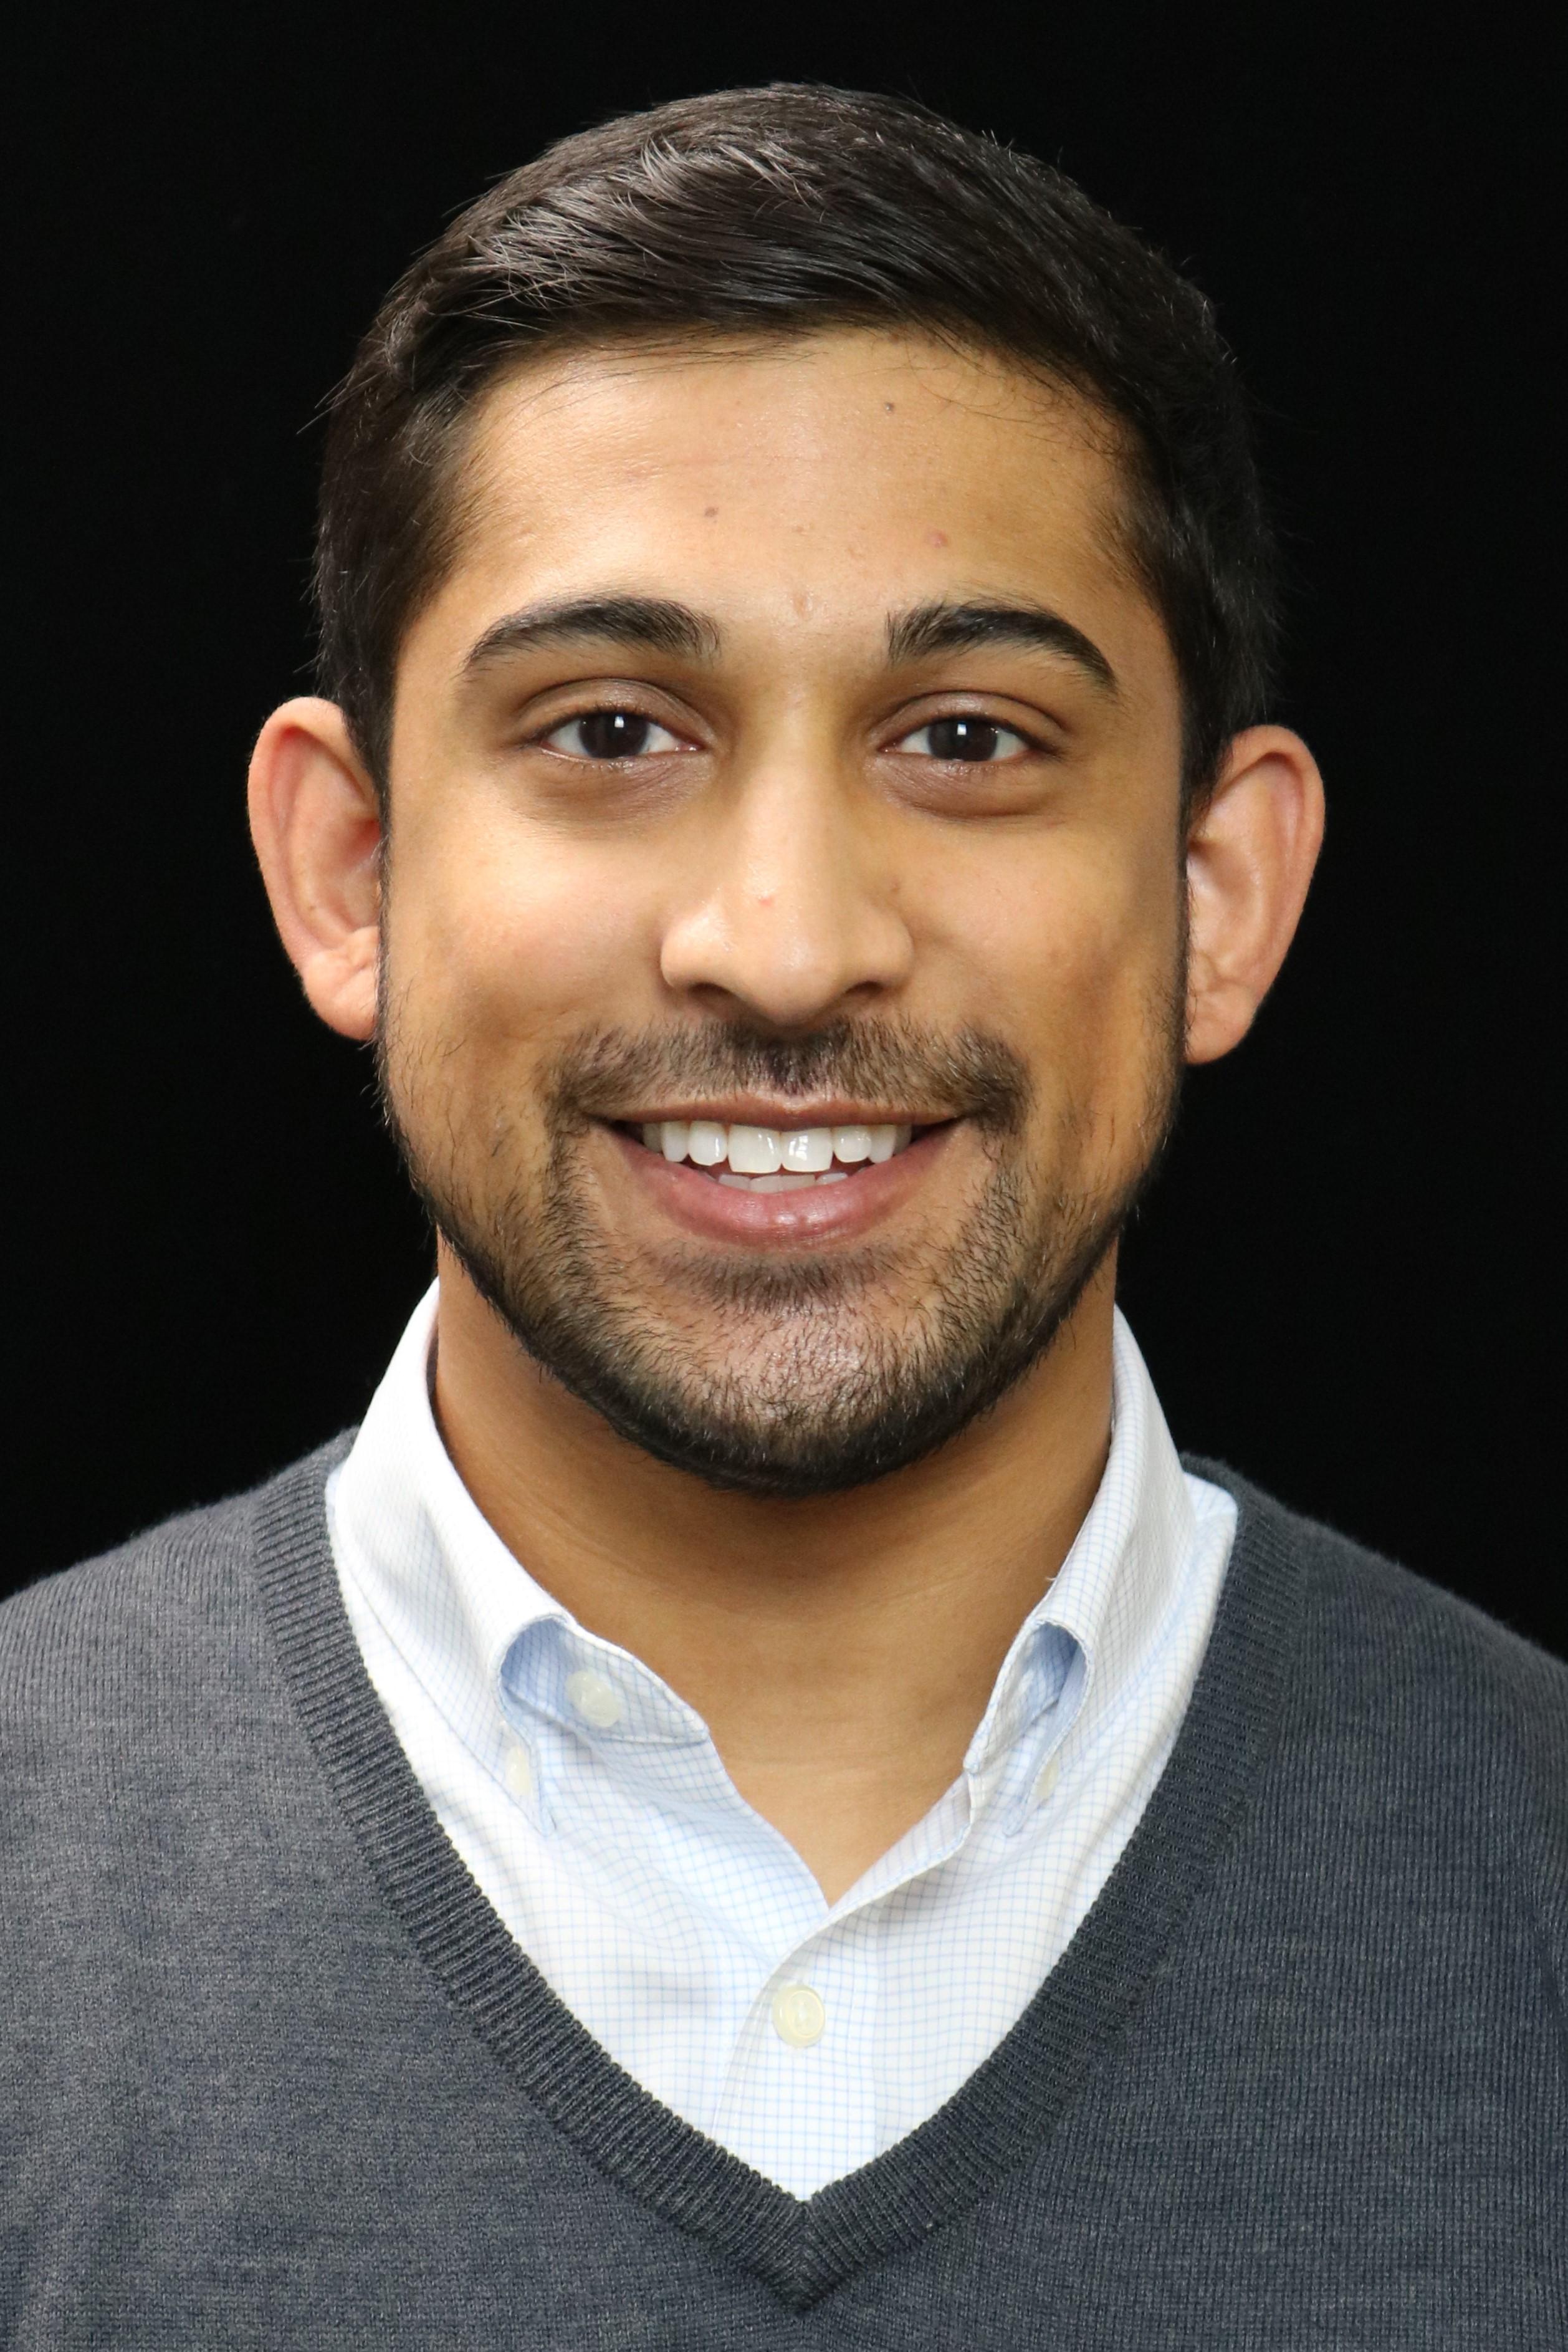 headshot of Sadeq Khan